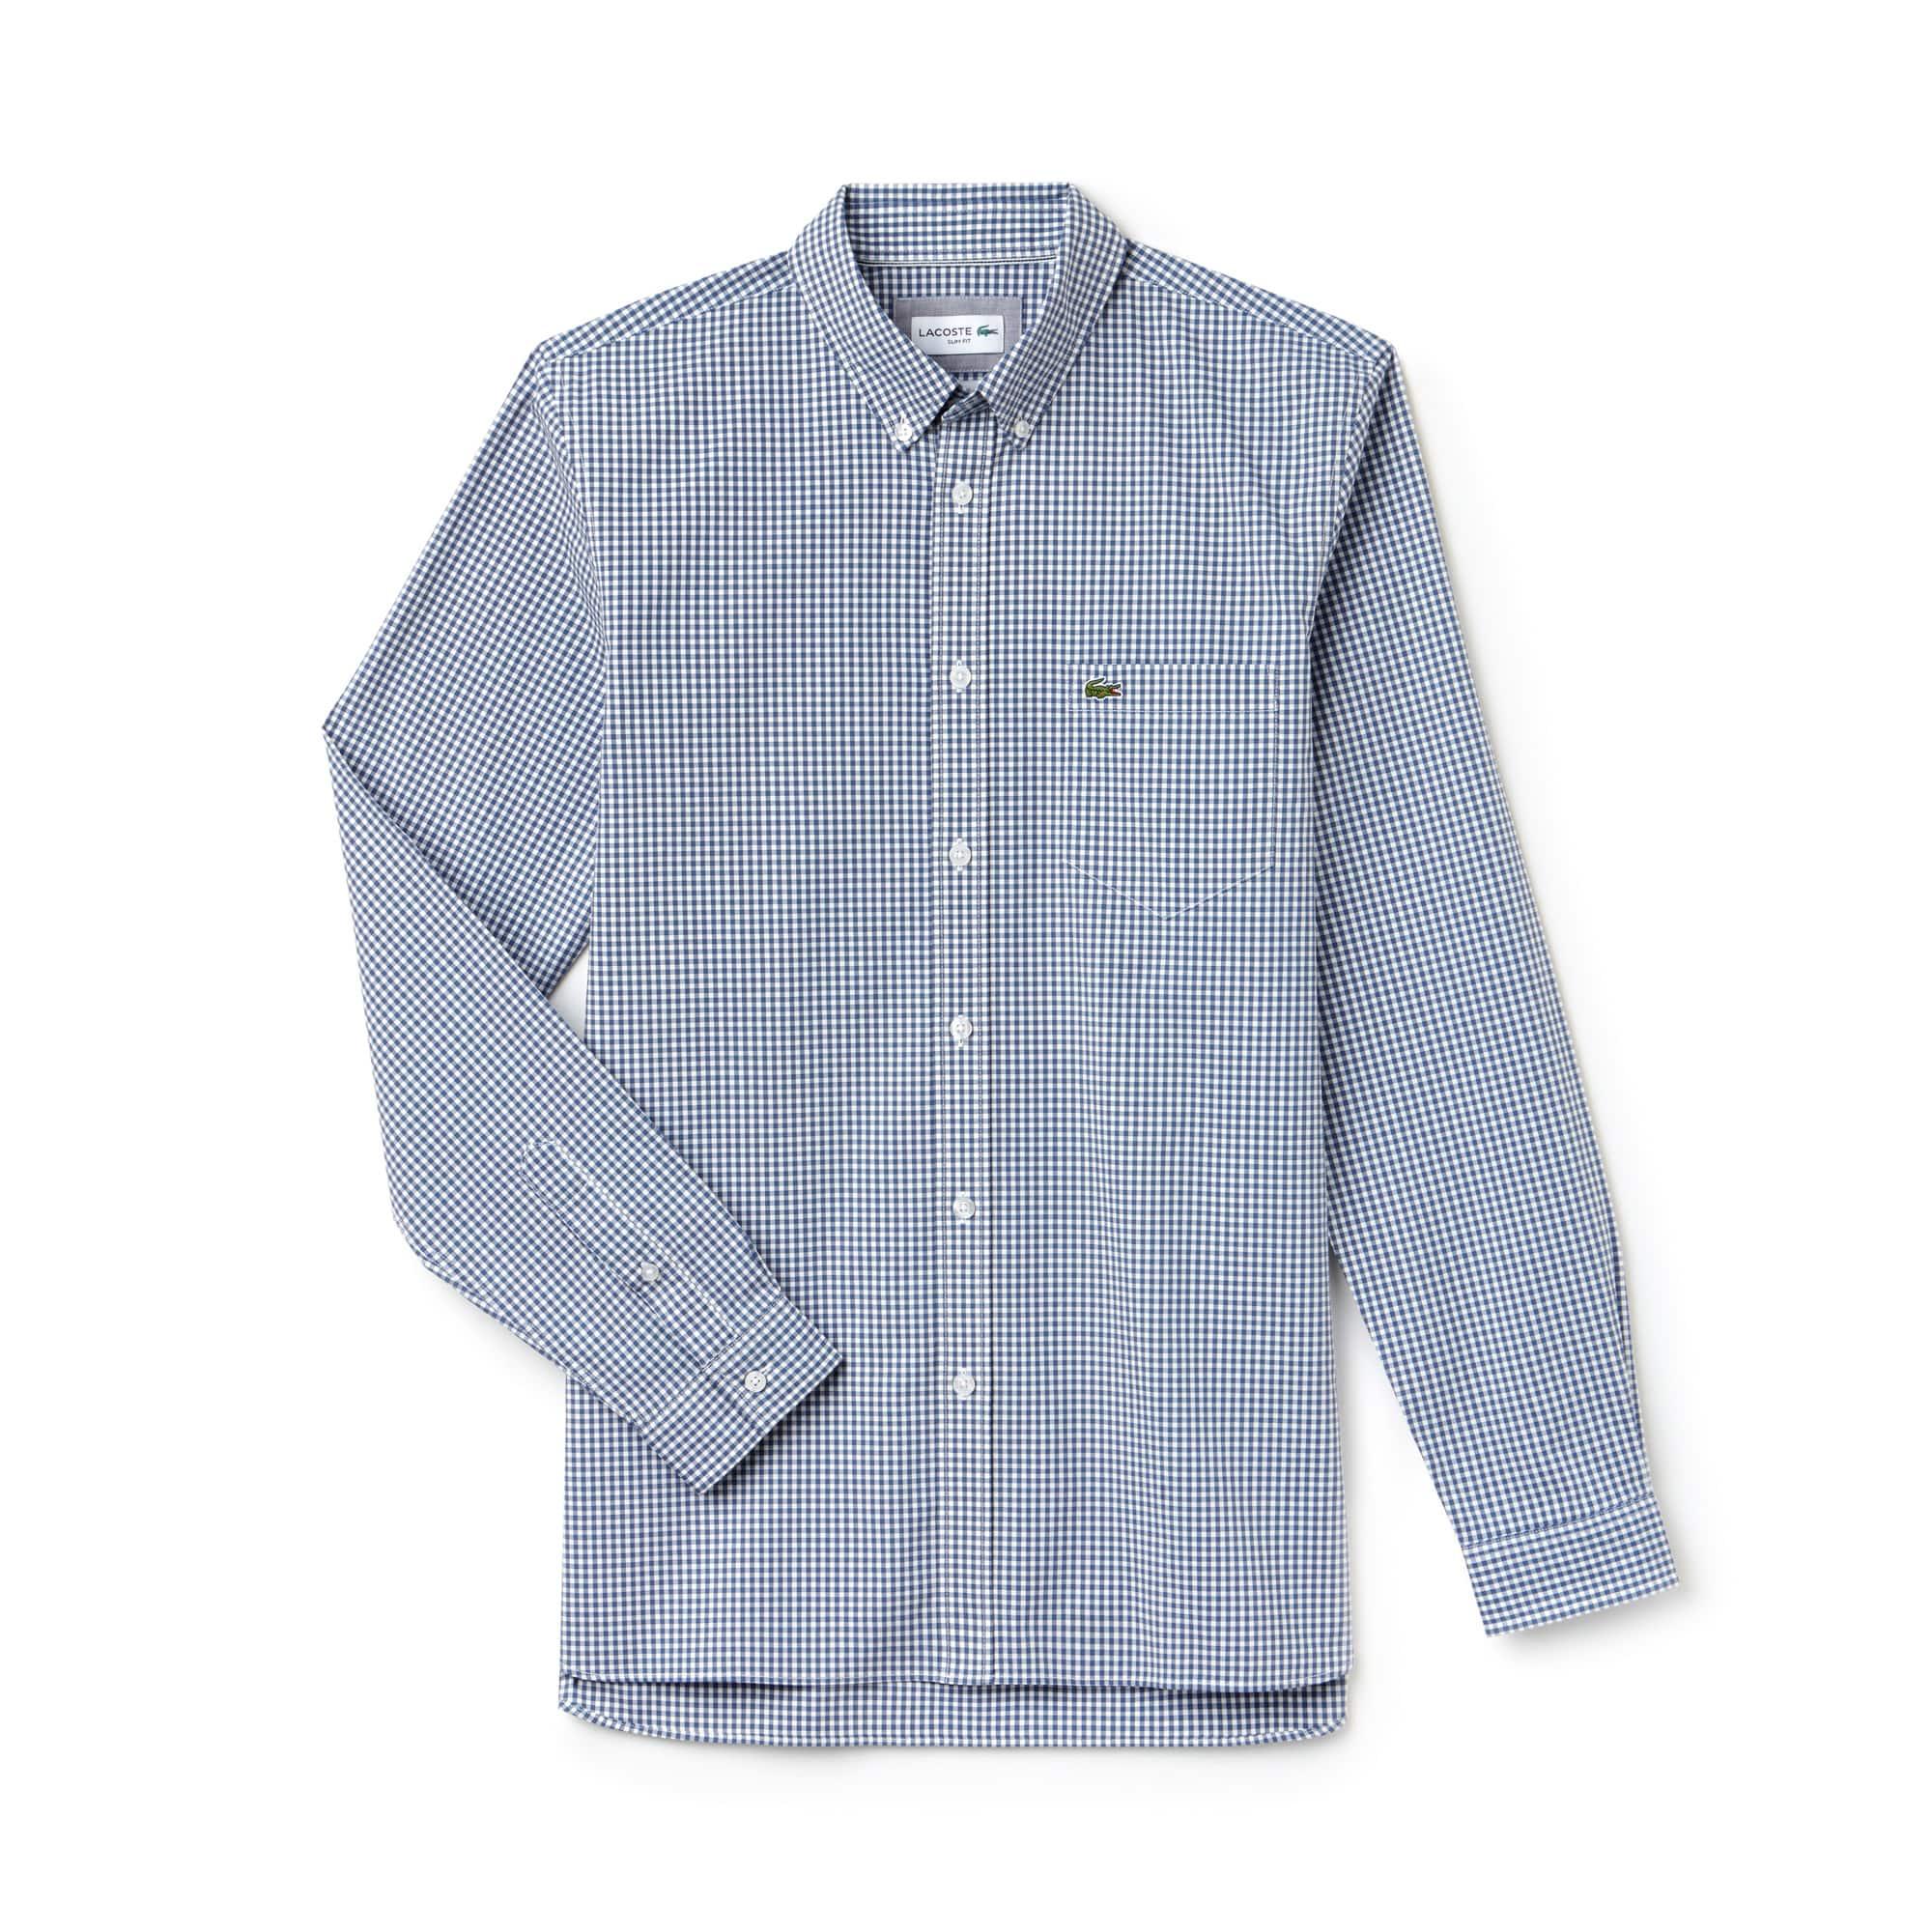 Men's Slim Fit Gingham Stretch Cotton Poplin Shirt